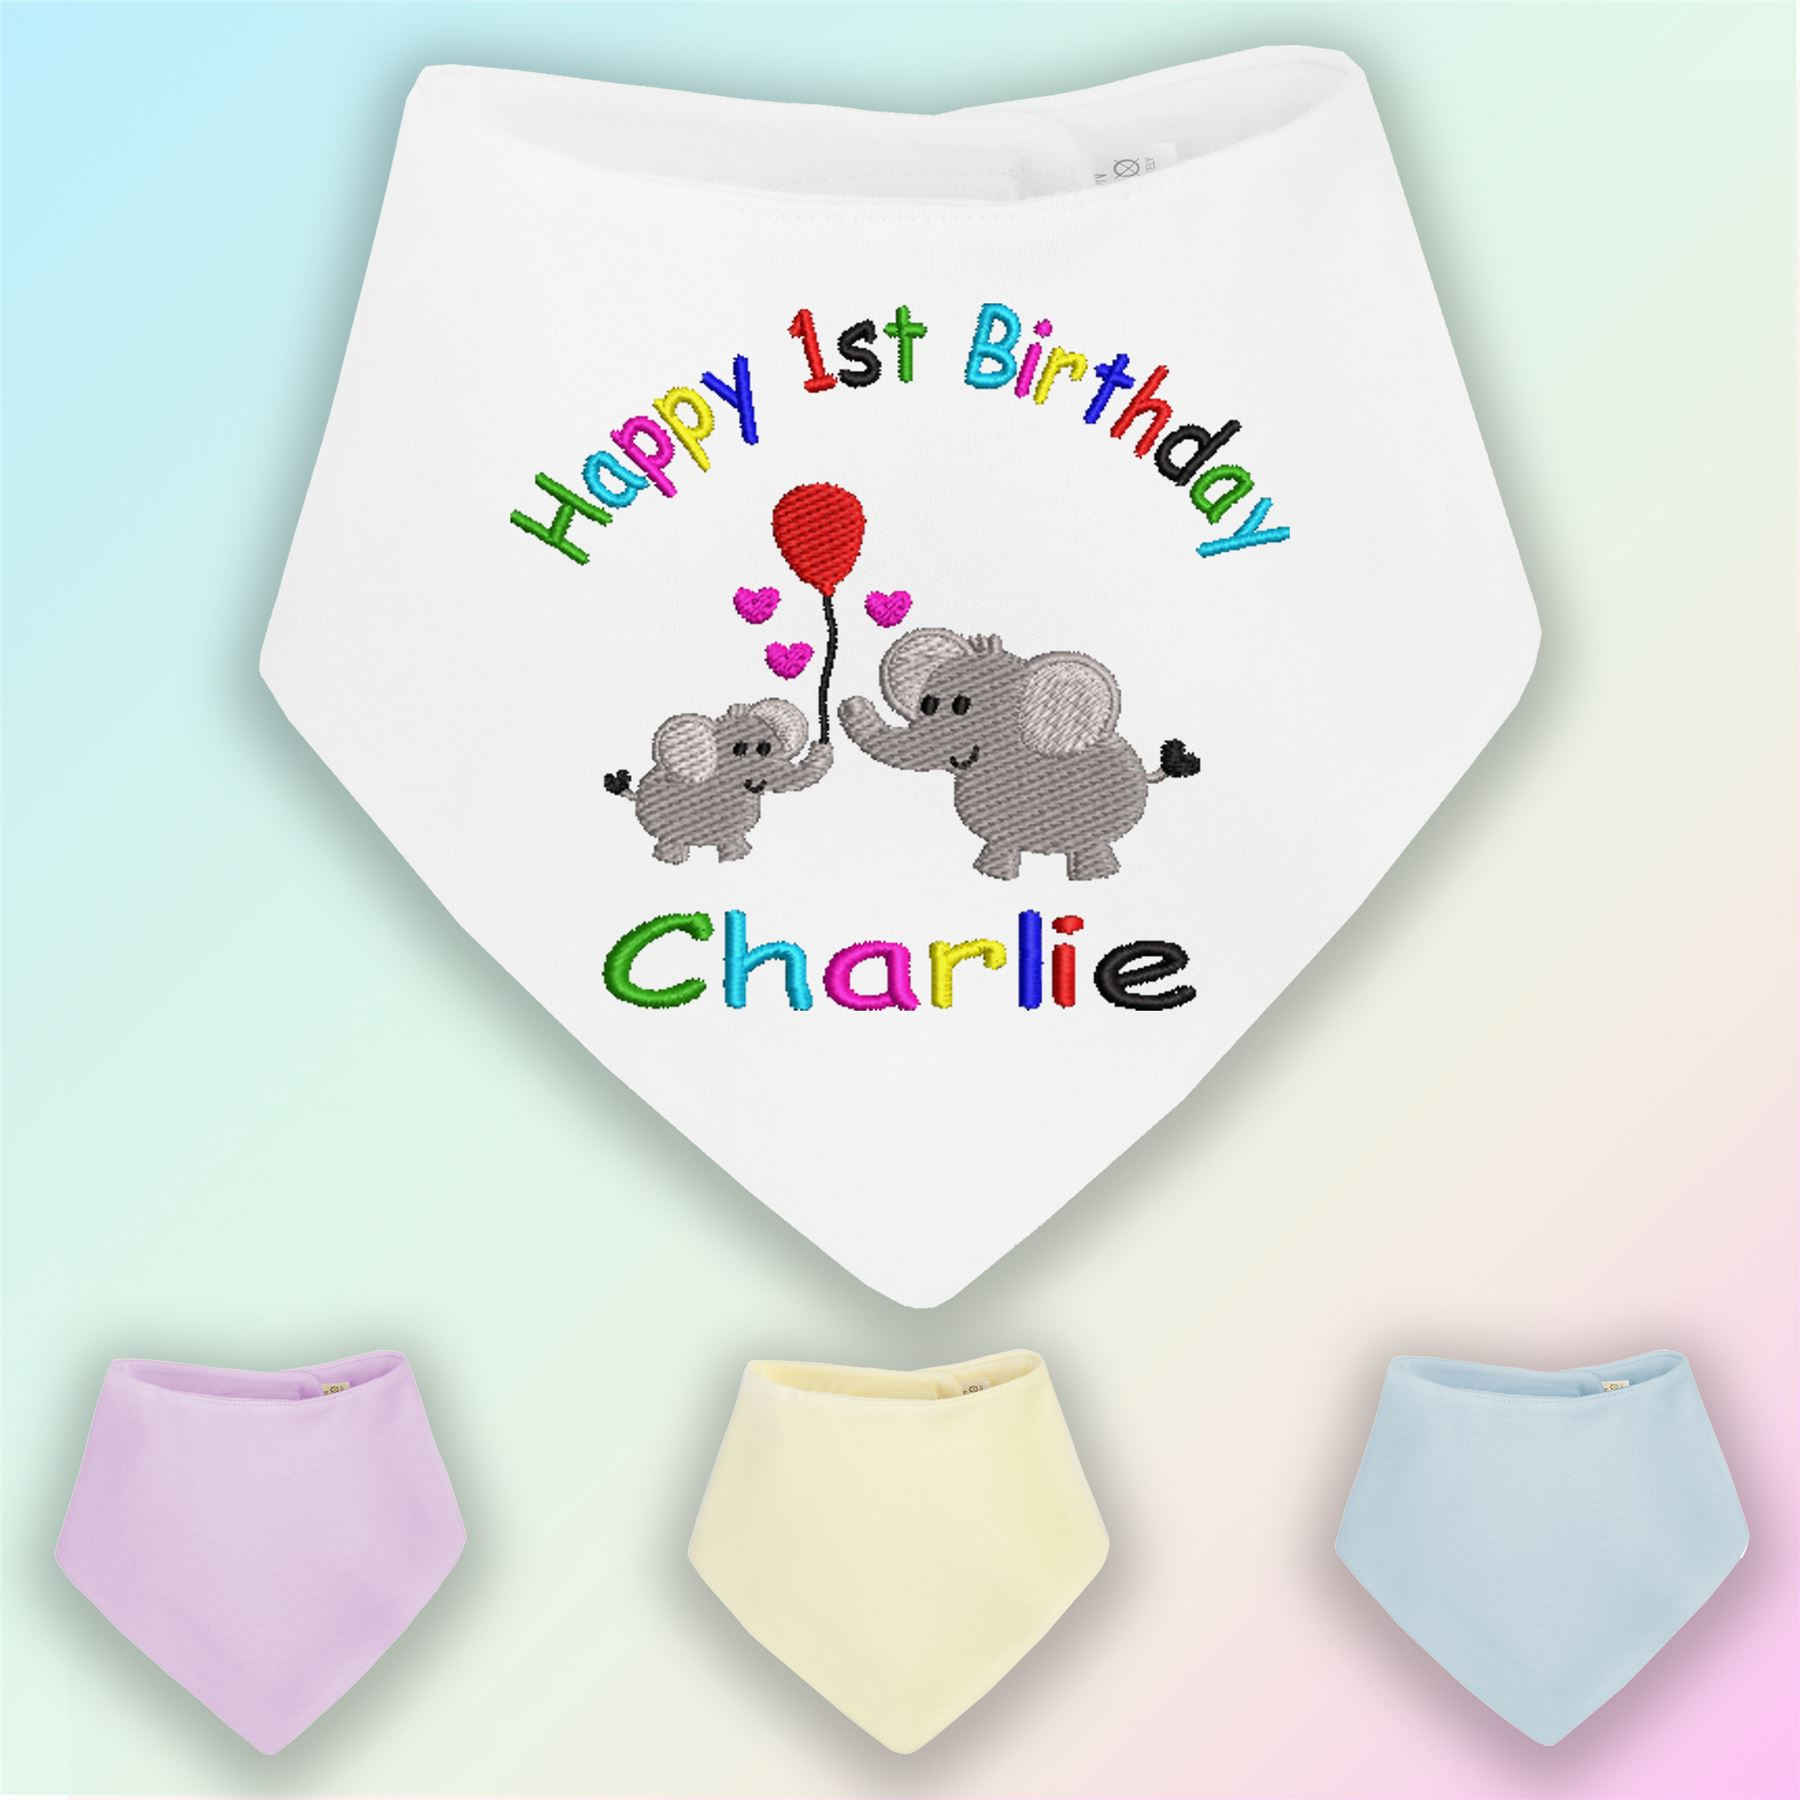 1st Birthday Rainbow Embroidered Baby Bandana Dribble Bib Gift Personalised